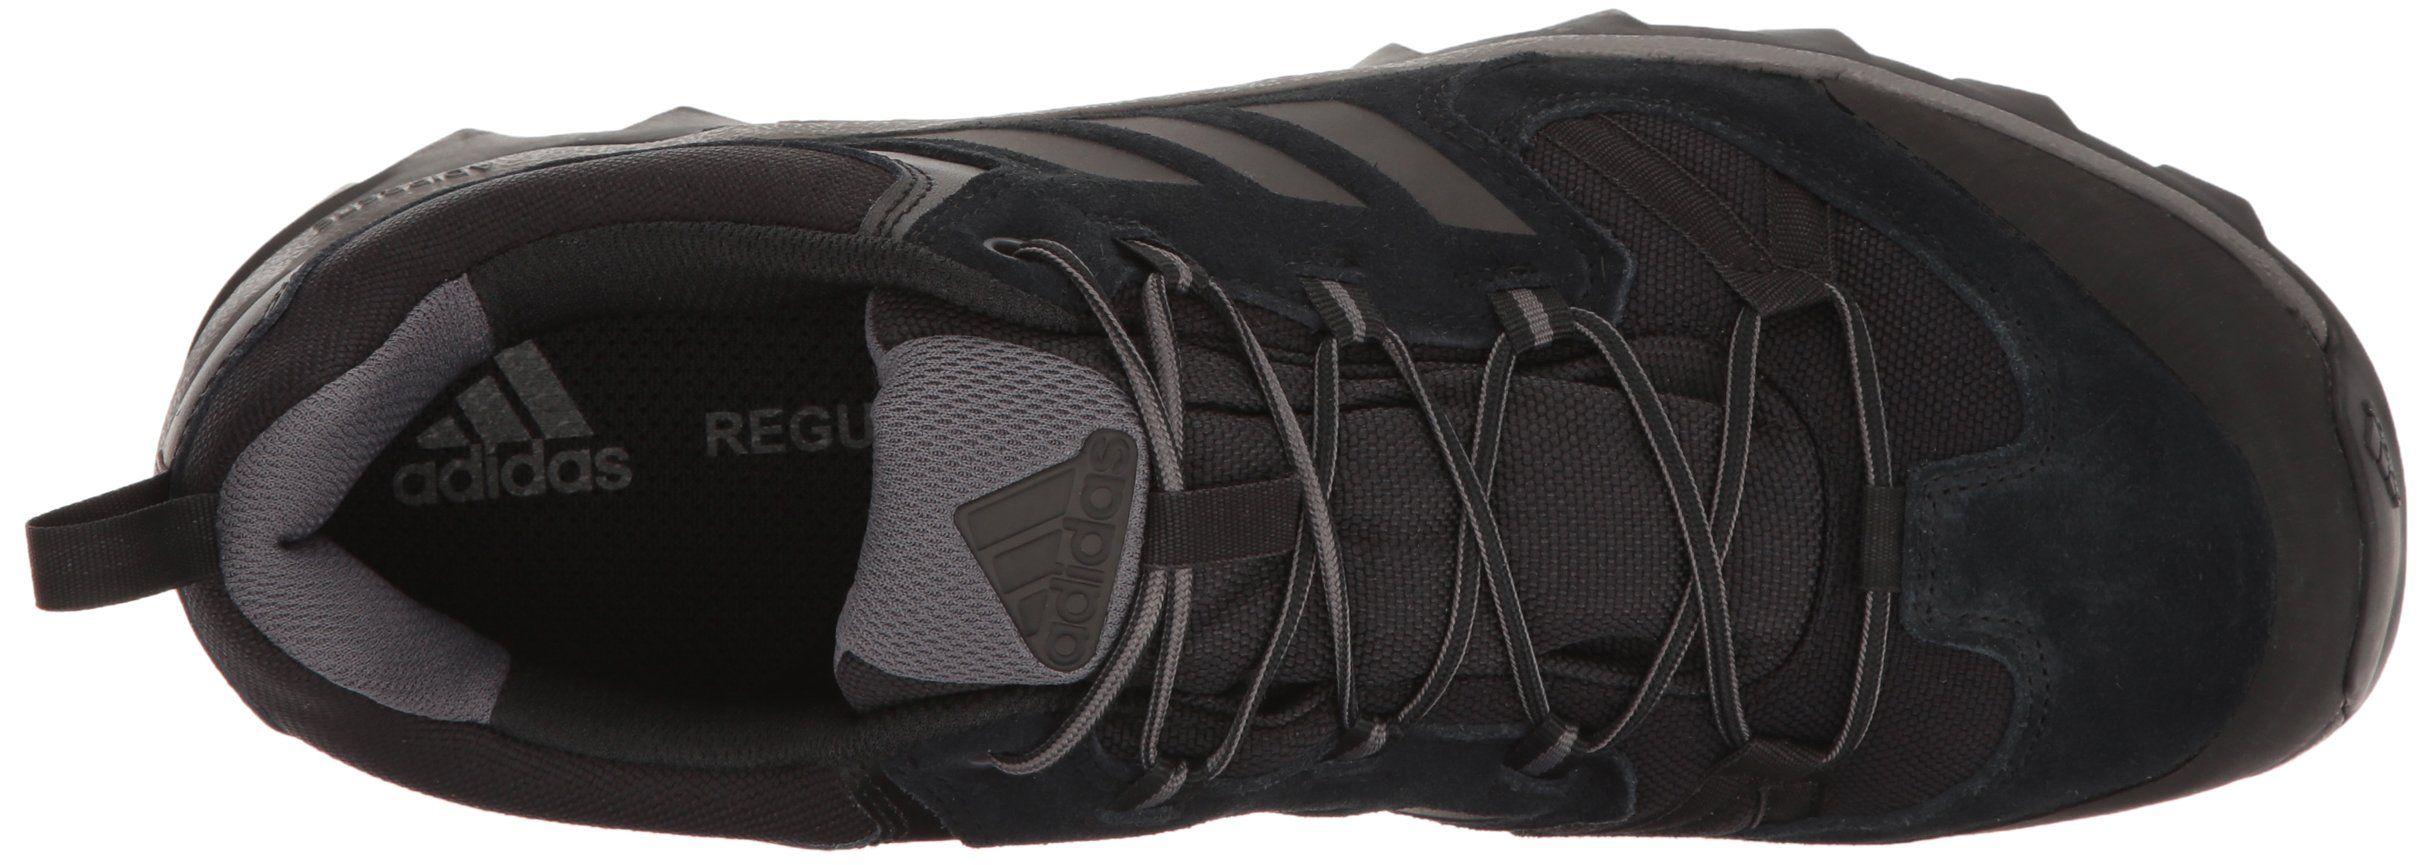 new concept d77d8 eb07c adidas Outdoor Mens Caprock GoreTex Hiking Shoe GraniteBlackNight Met 8 M  US  Read more at the image link-affiliate link. campingandhikingshoes